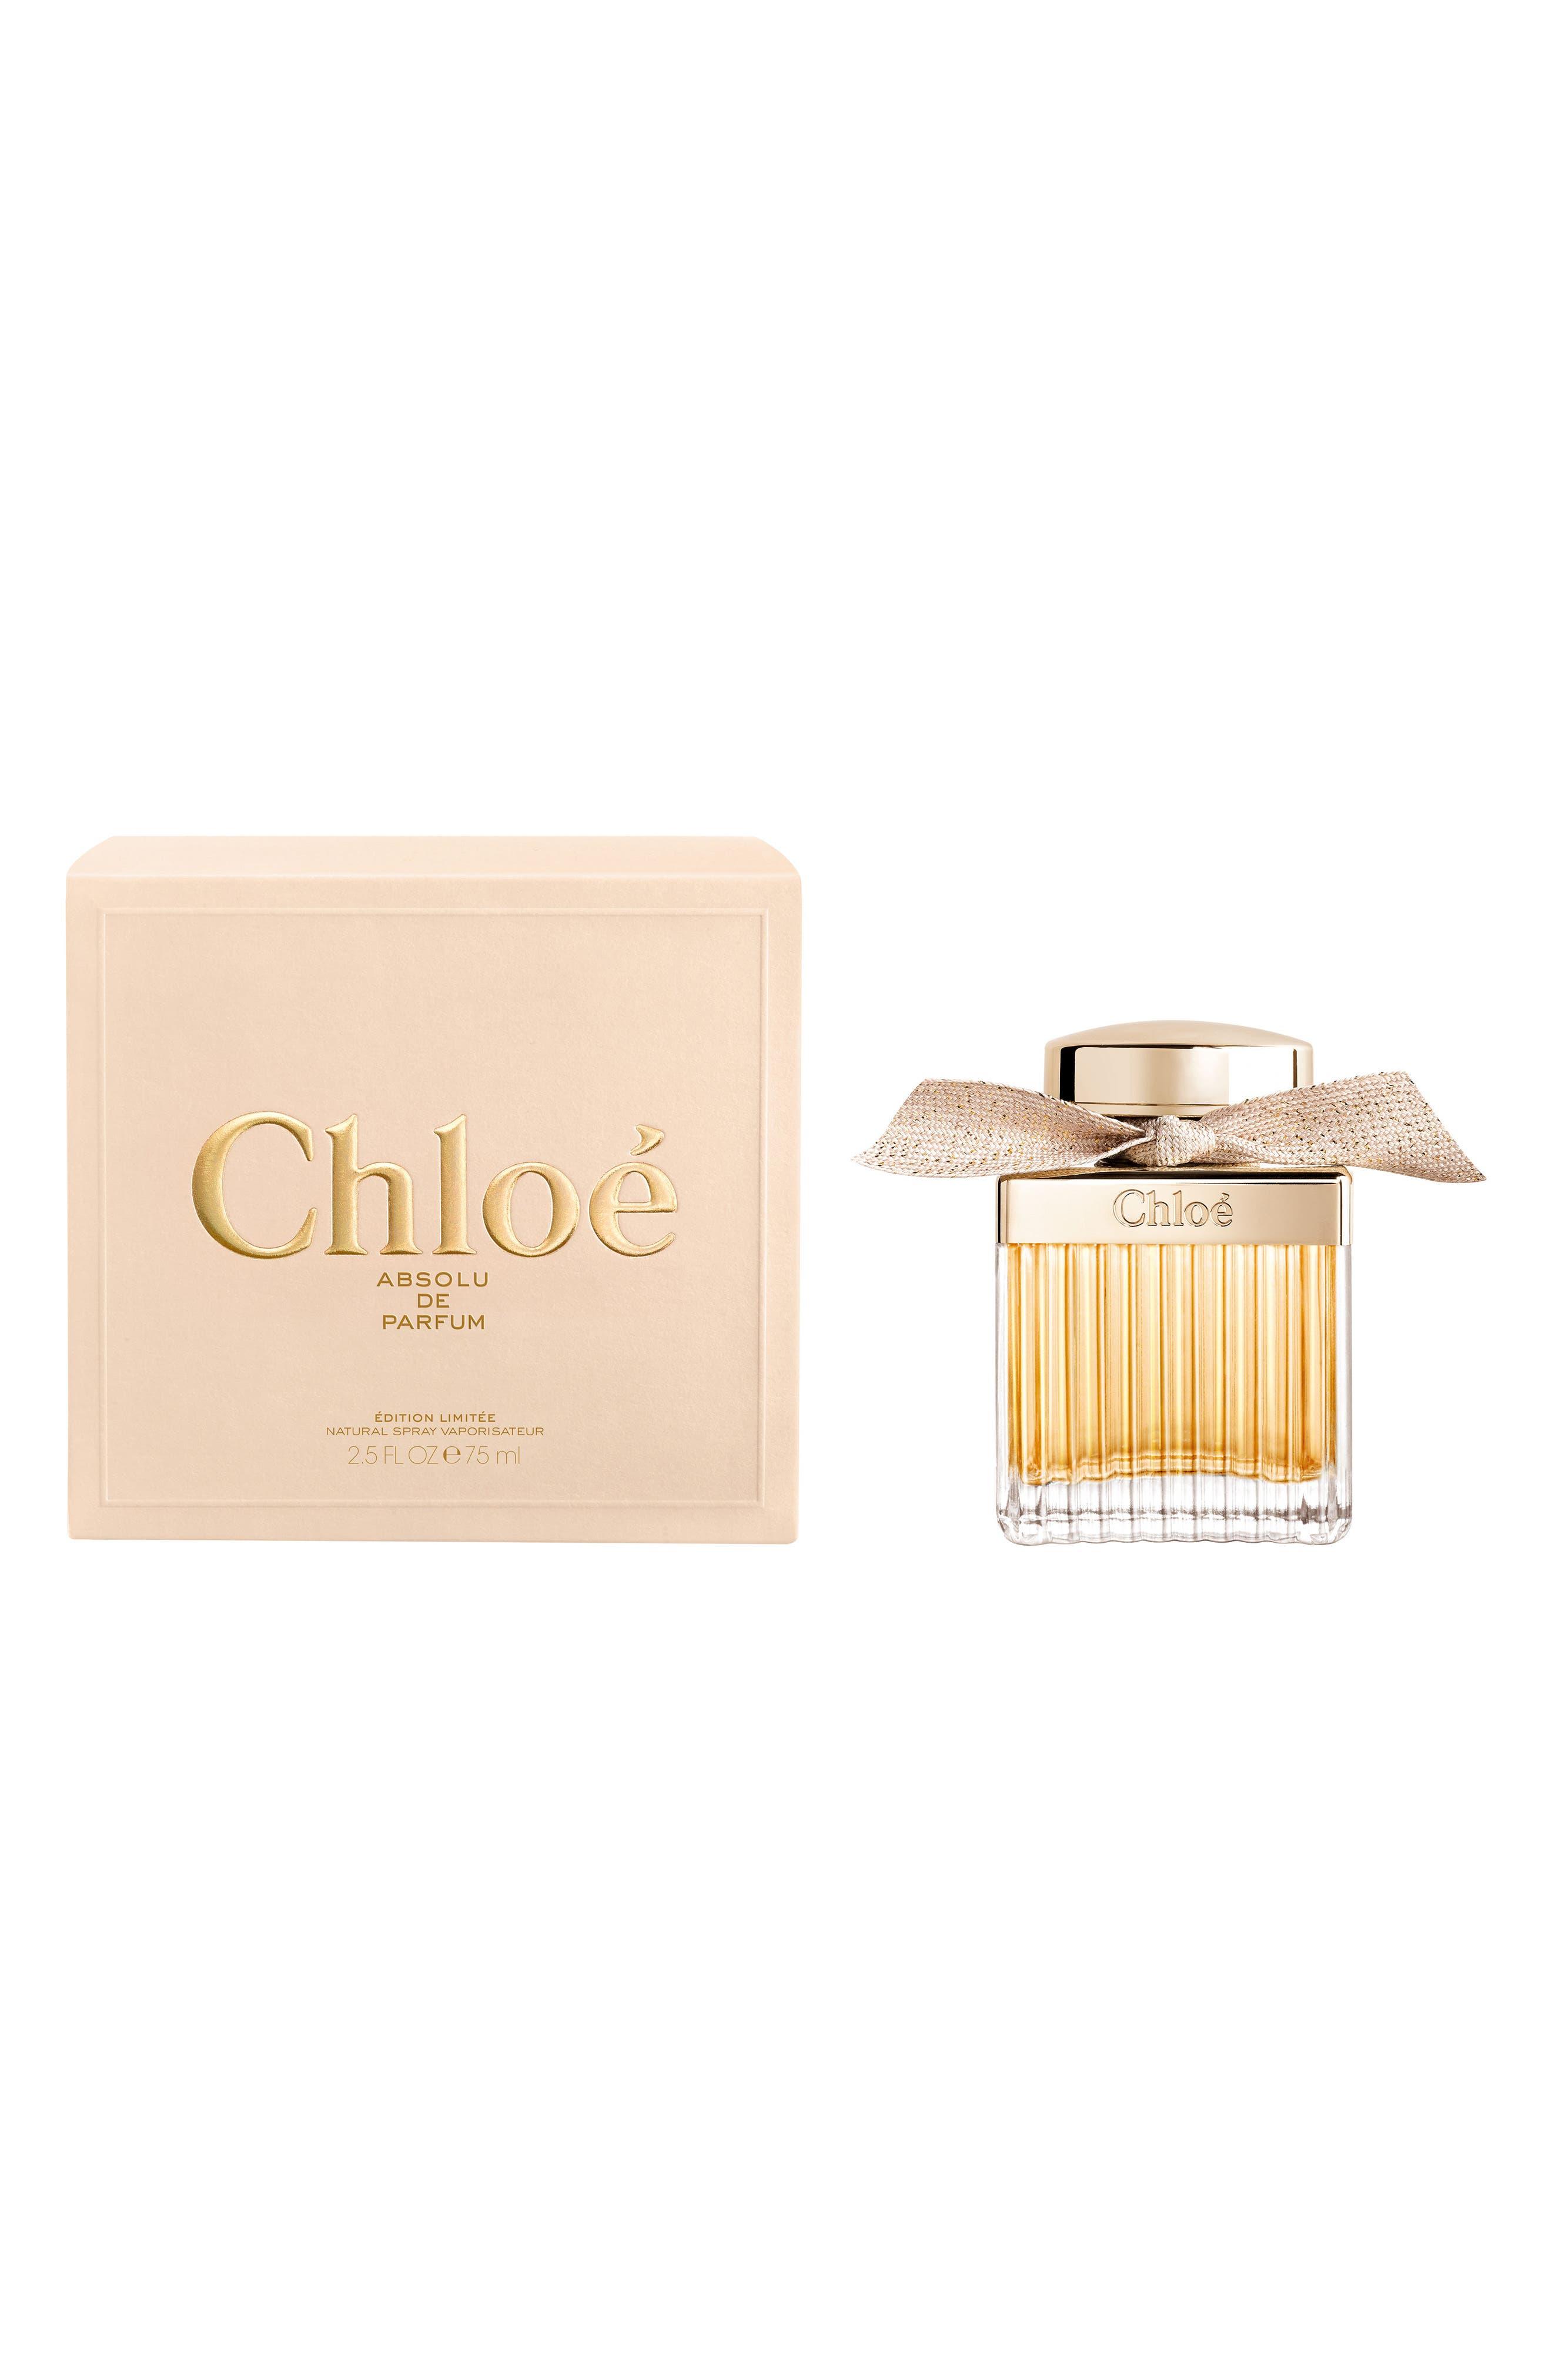 Chloé Absolu de Parfum (Limited Edition)